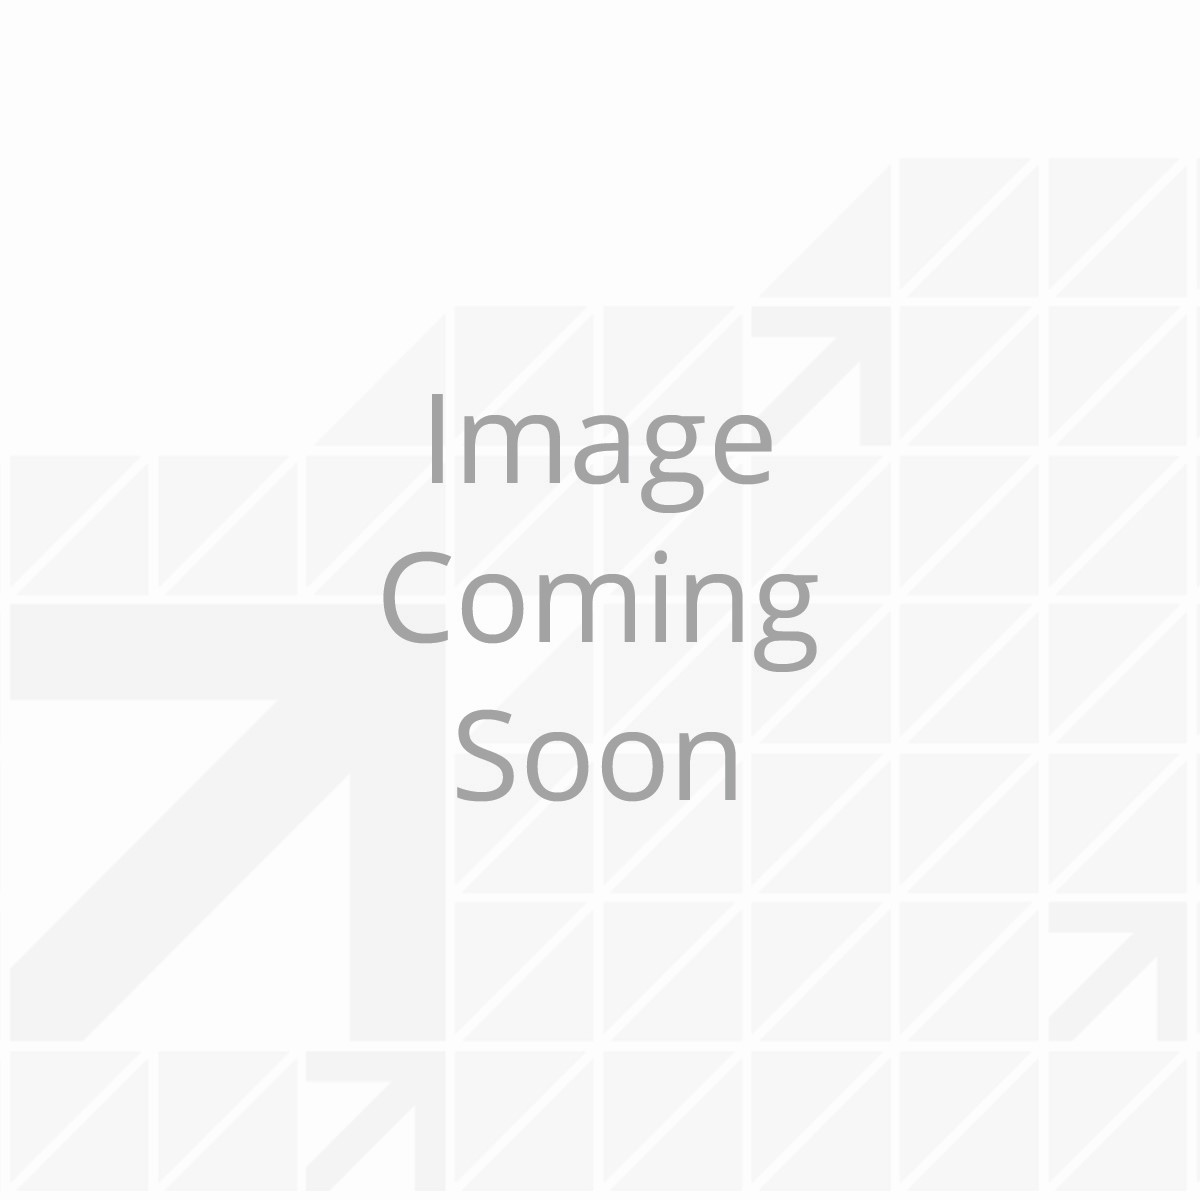 3 Burner Range Cooktopadc96a4e70ad72e74ee444d479332f2c46bbc750 2 Jpg